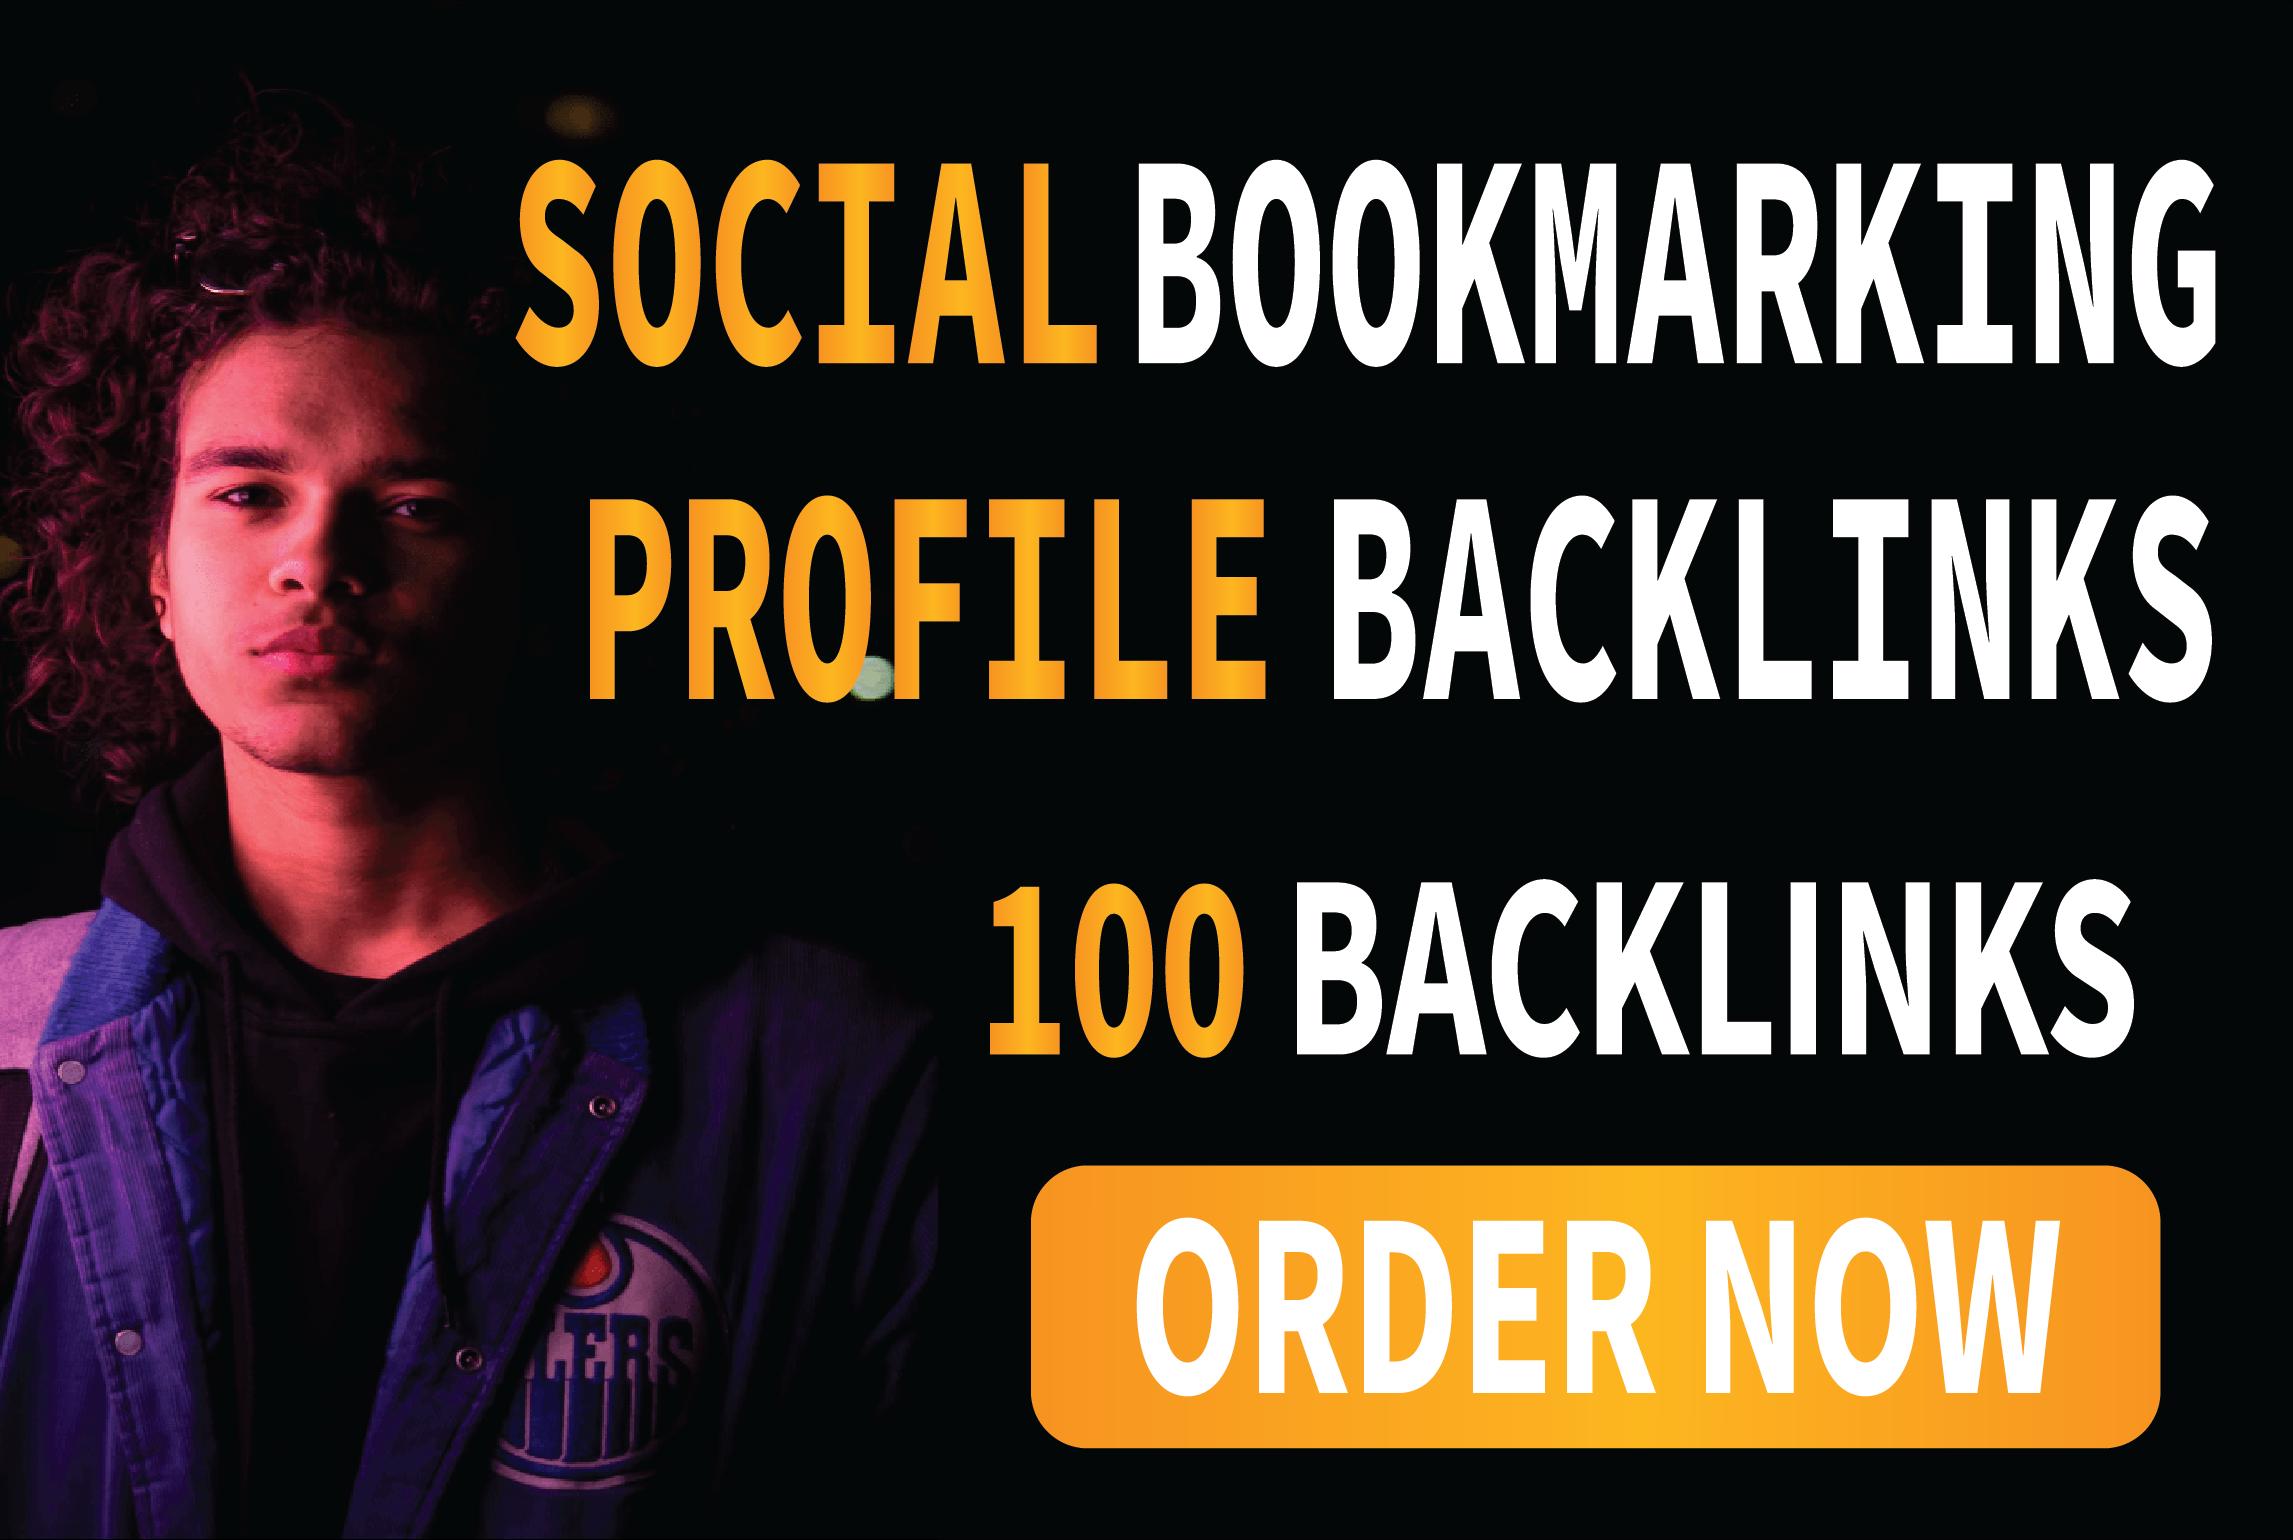 I will do 300 social bookmarking SEO profile backlinks